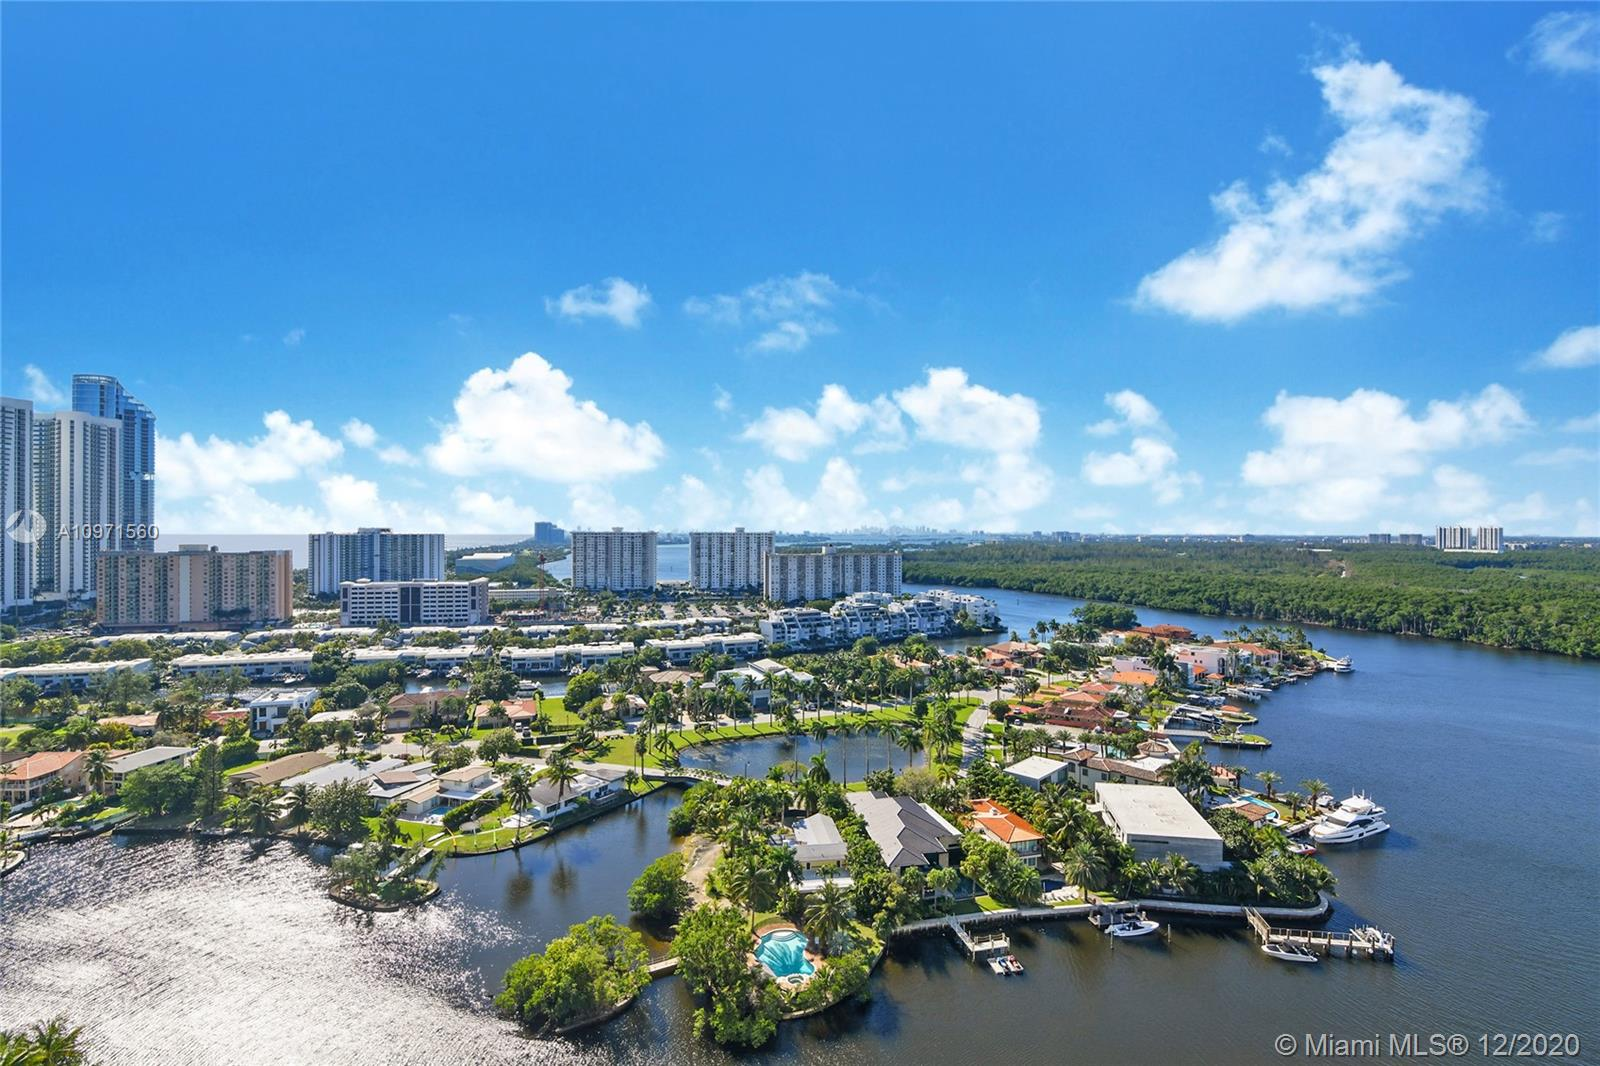 Parque Tower 2 #LPH-04 - 330 Sunny Isles Boulevard #LPH-04, Sunny Isles Beach, FL 33160